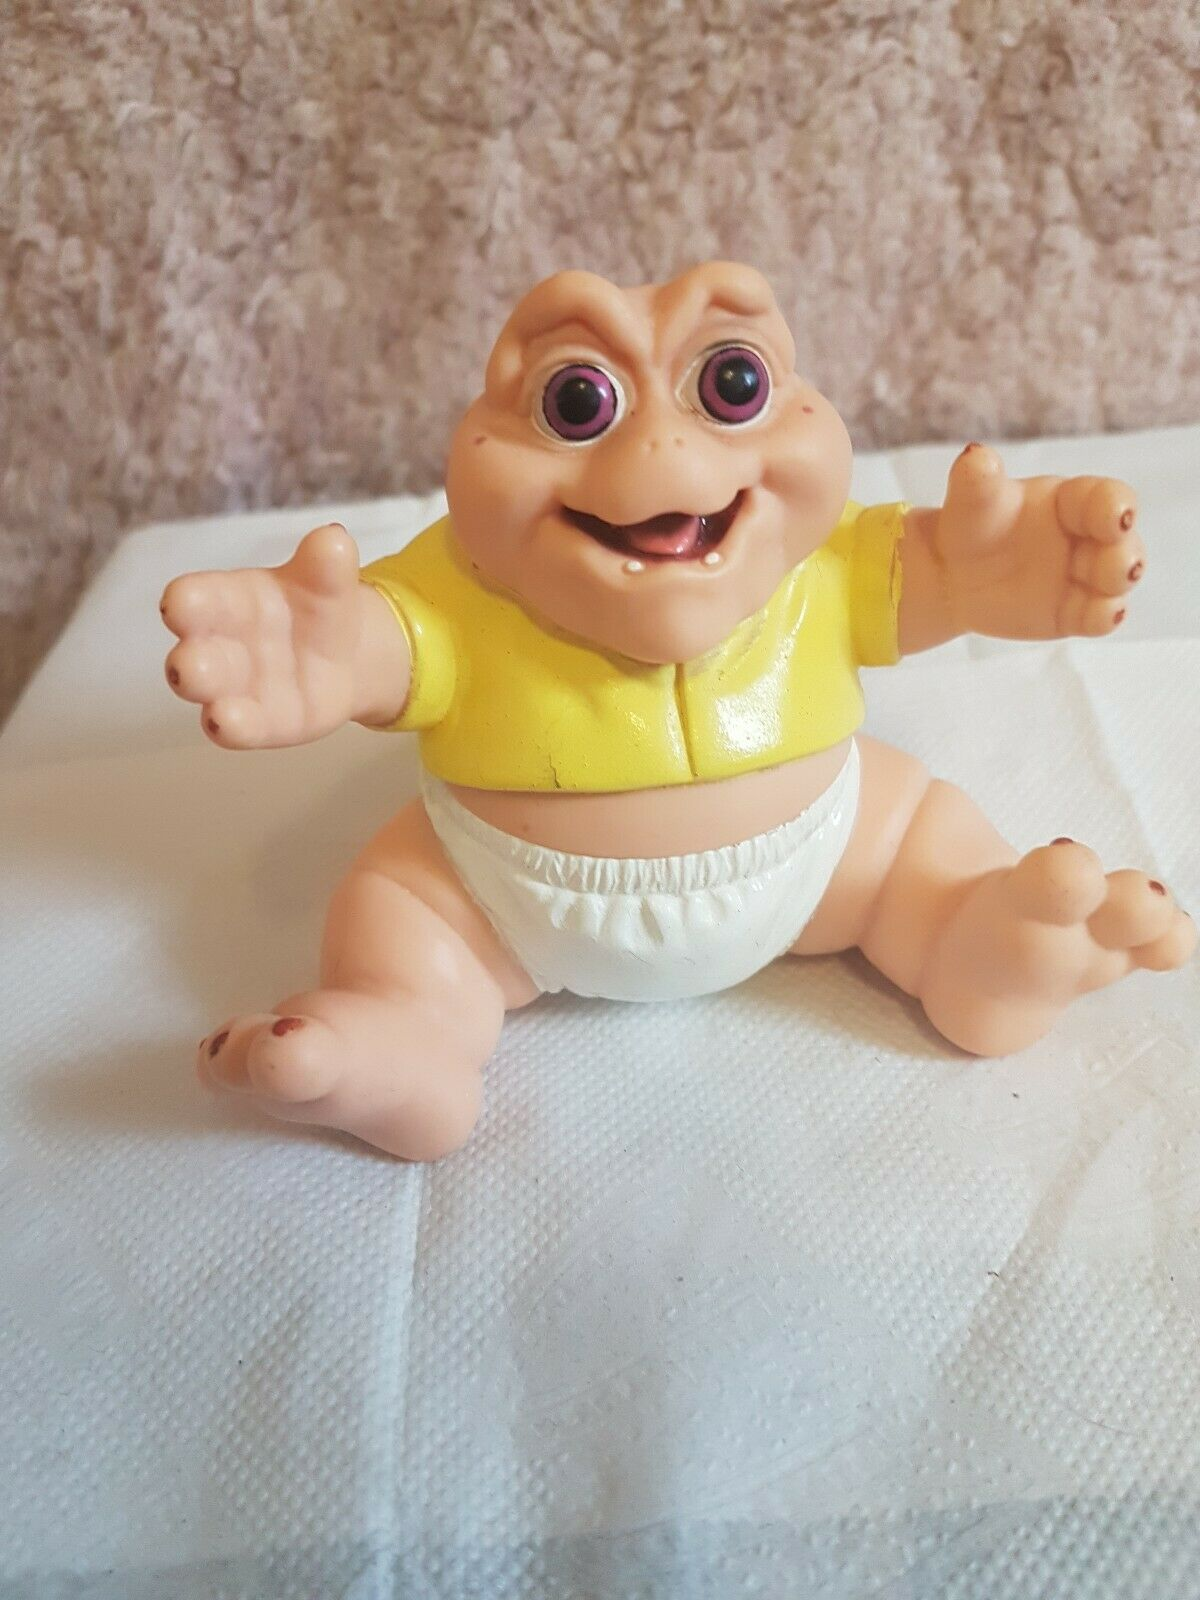 Vintage 1990's Jim Henson Dinosaurs Baby Sinclair Figure, disney